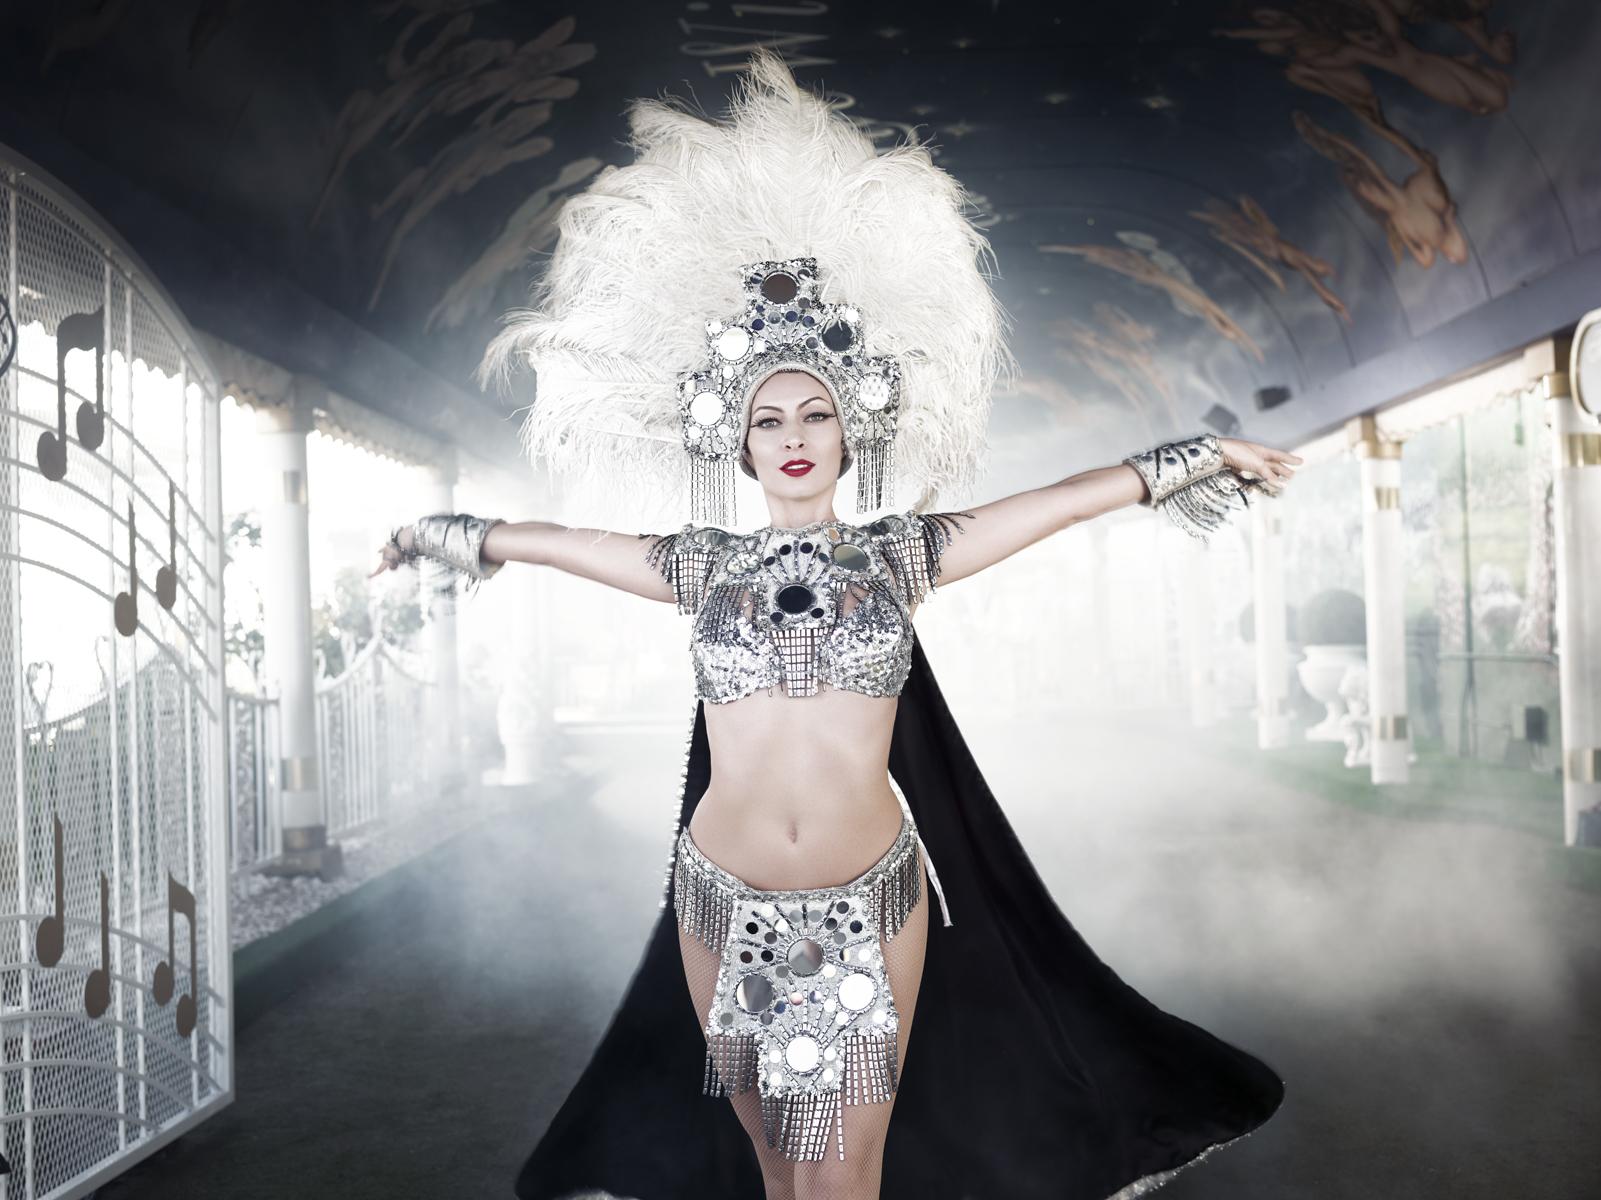 Las Vegas - Showgirl